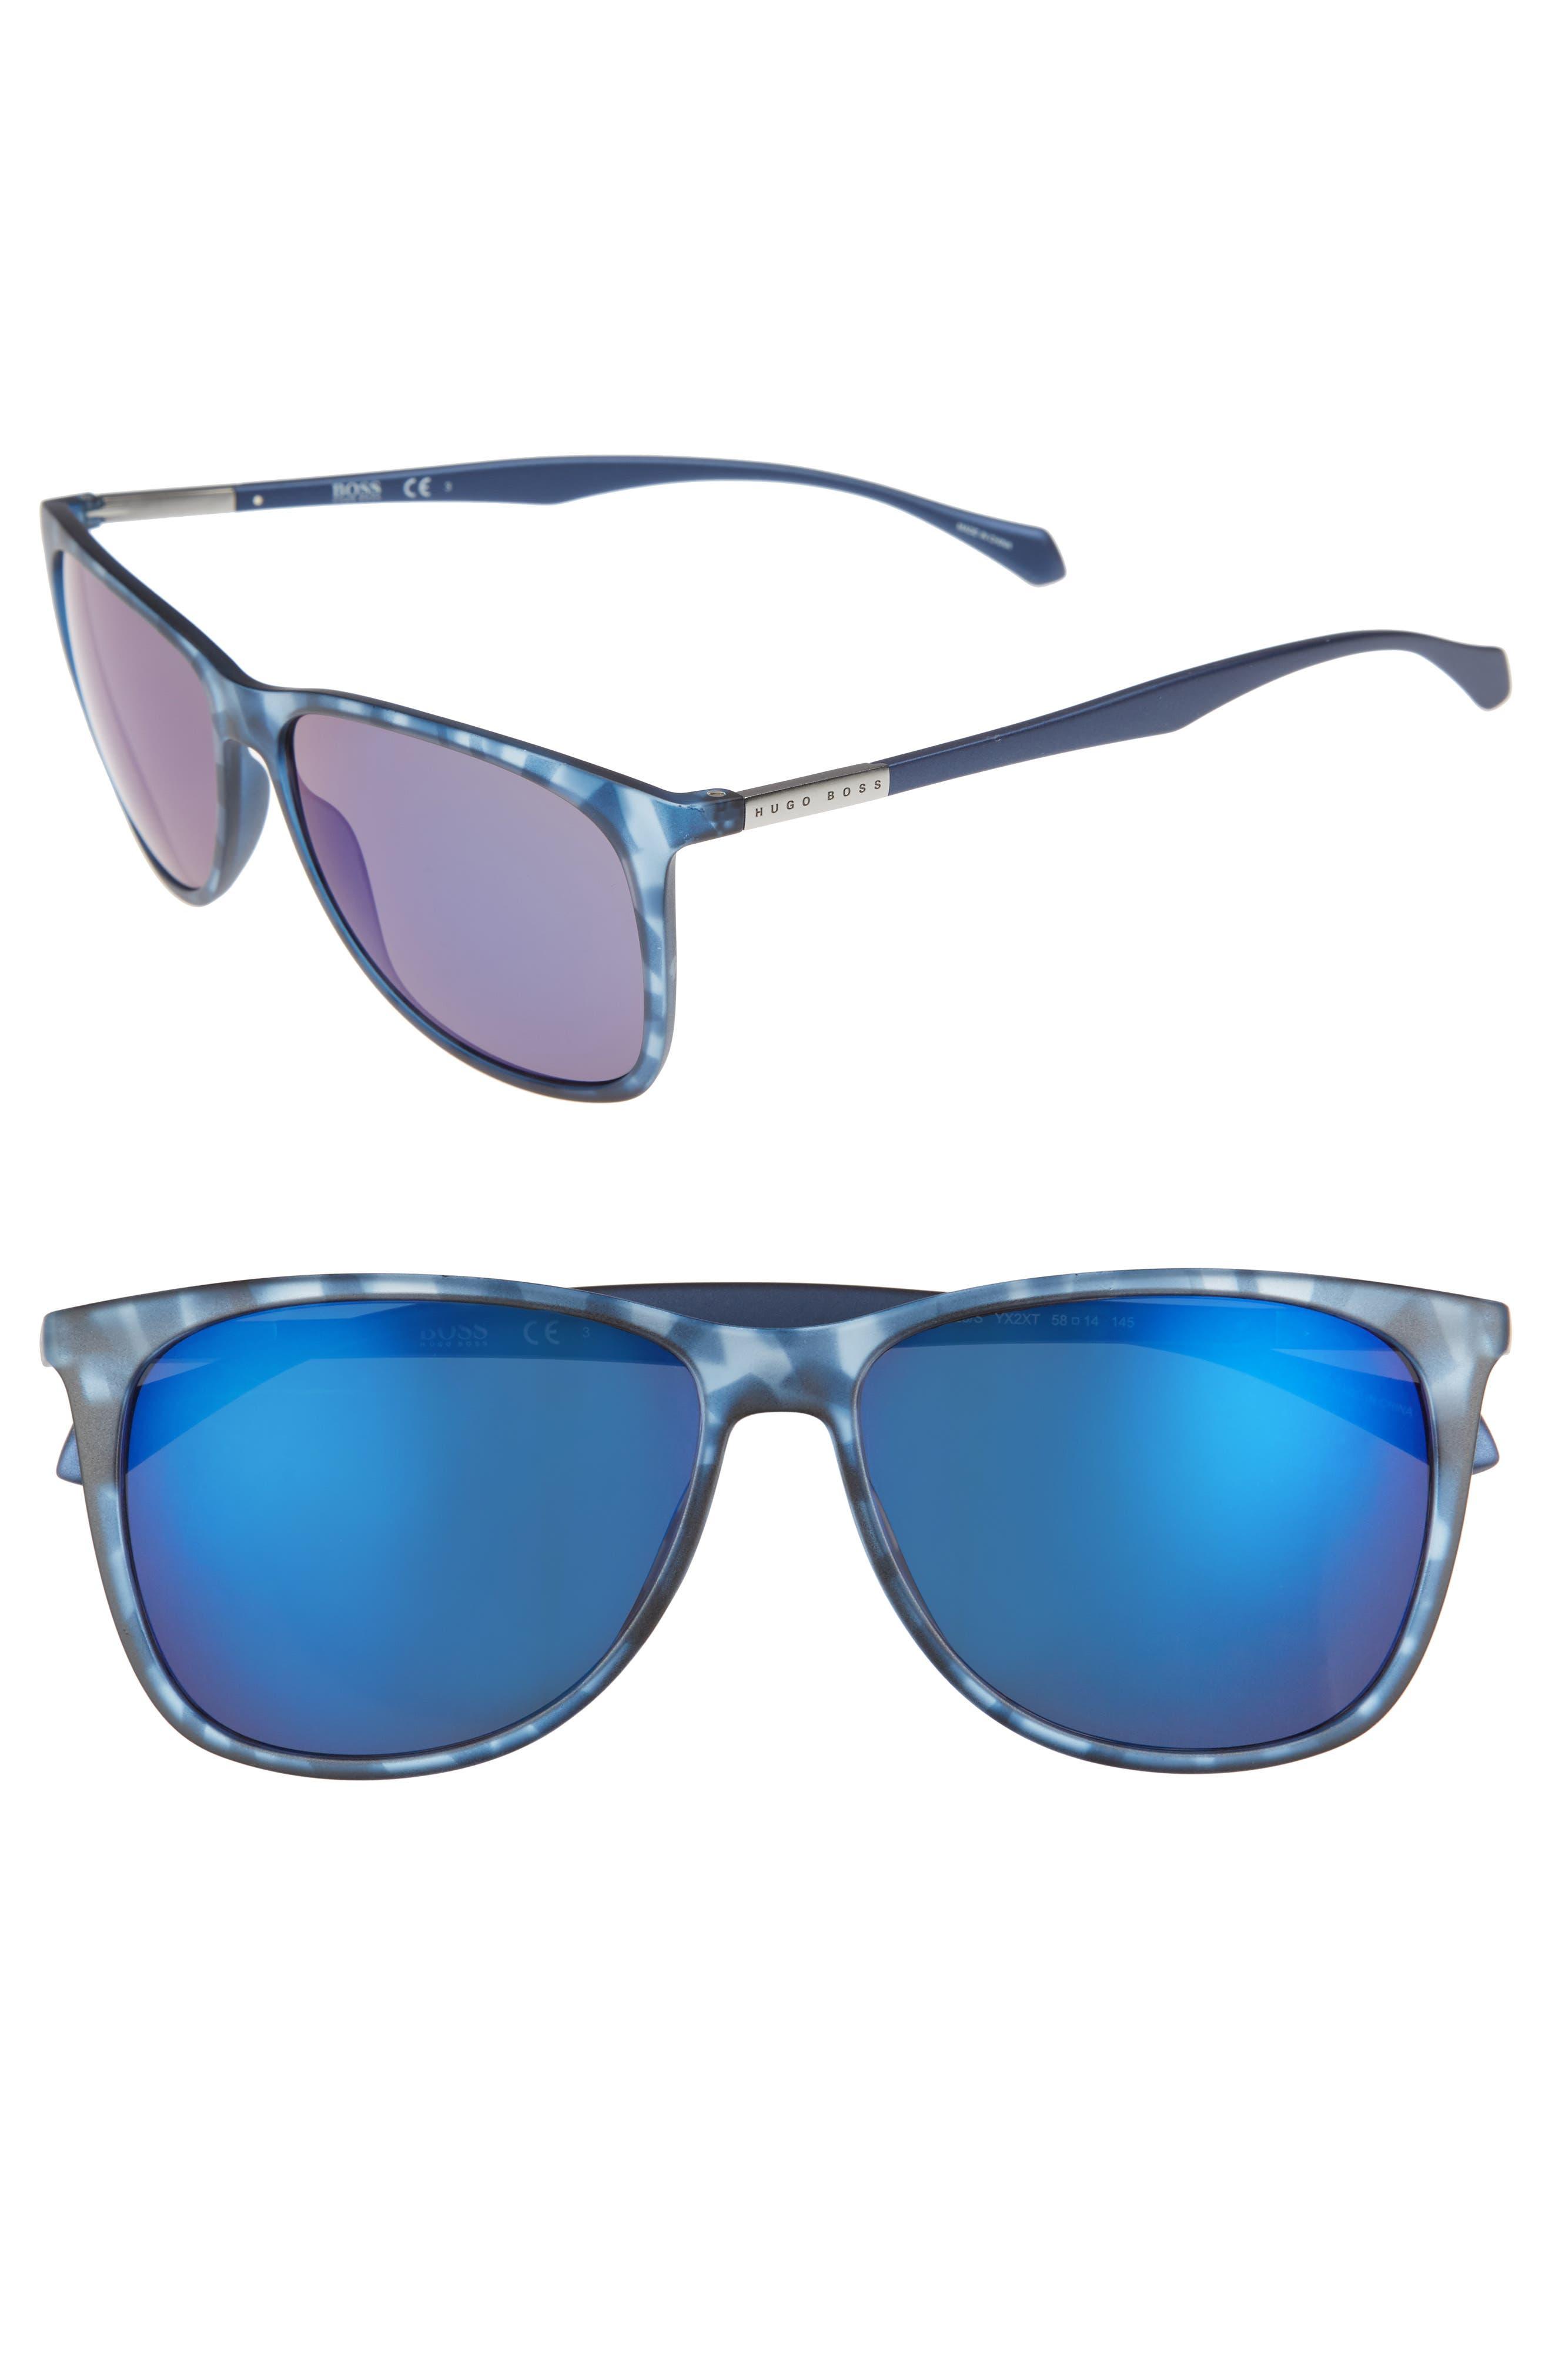 Hugo Boss Sunglasses 58MM SUNGLASSES - BLUE HAVANA/ BLUE SKY